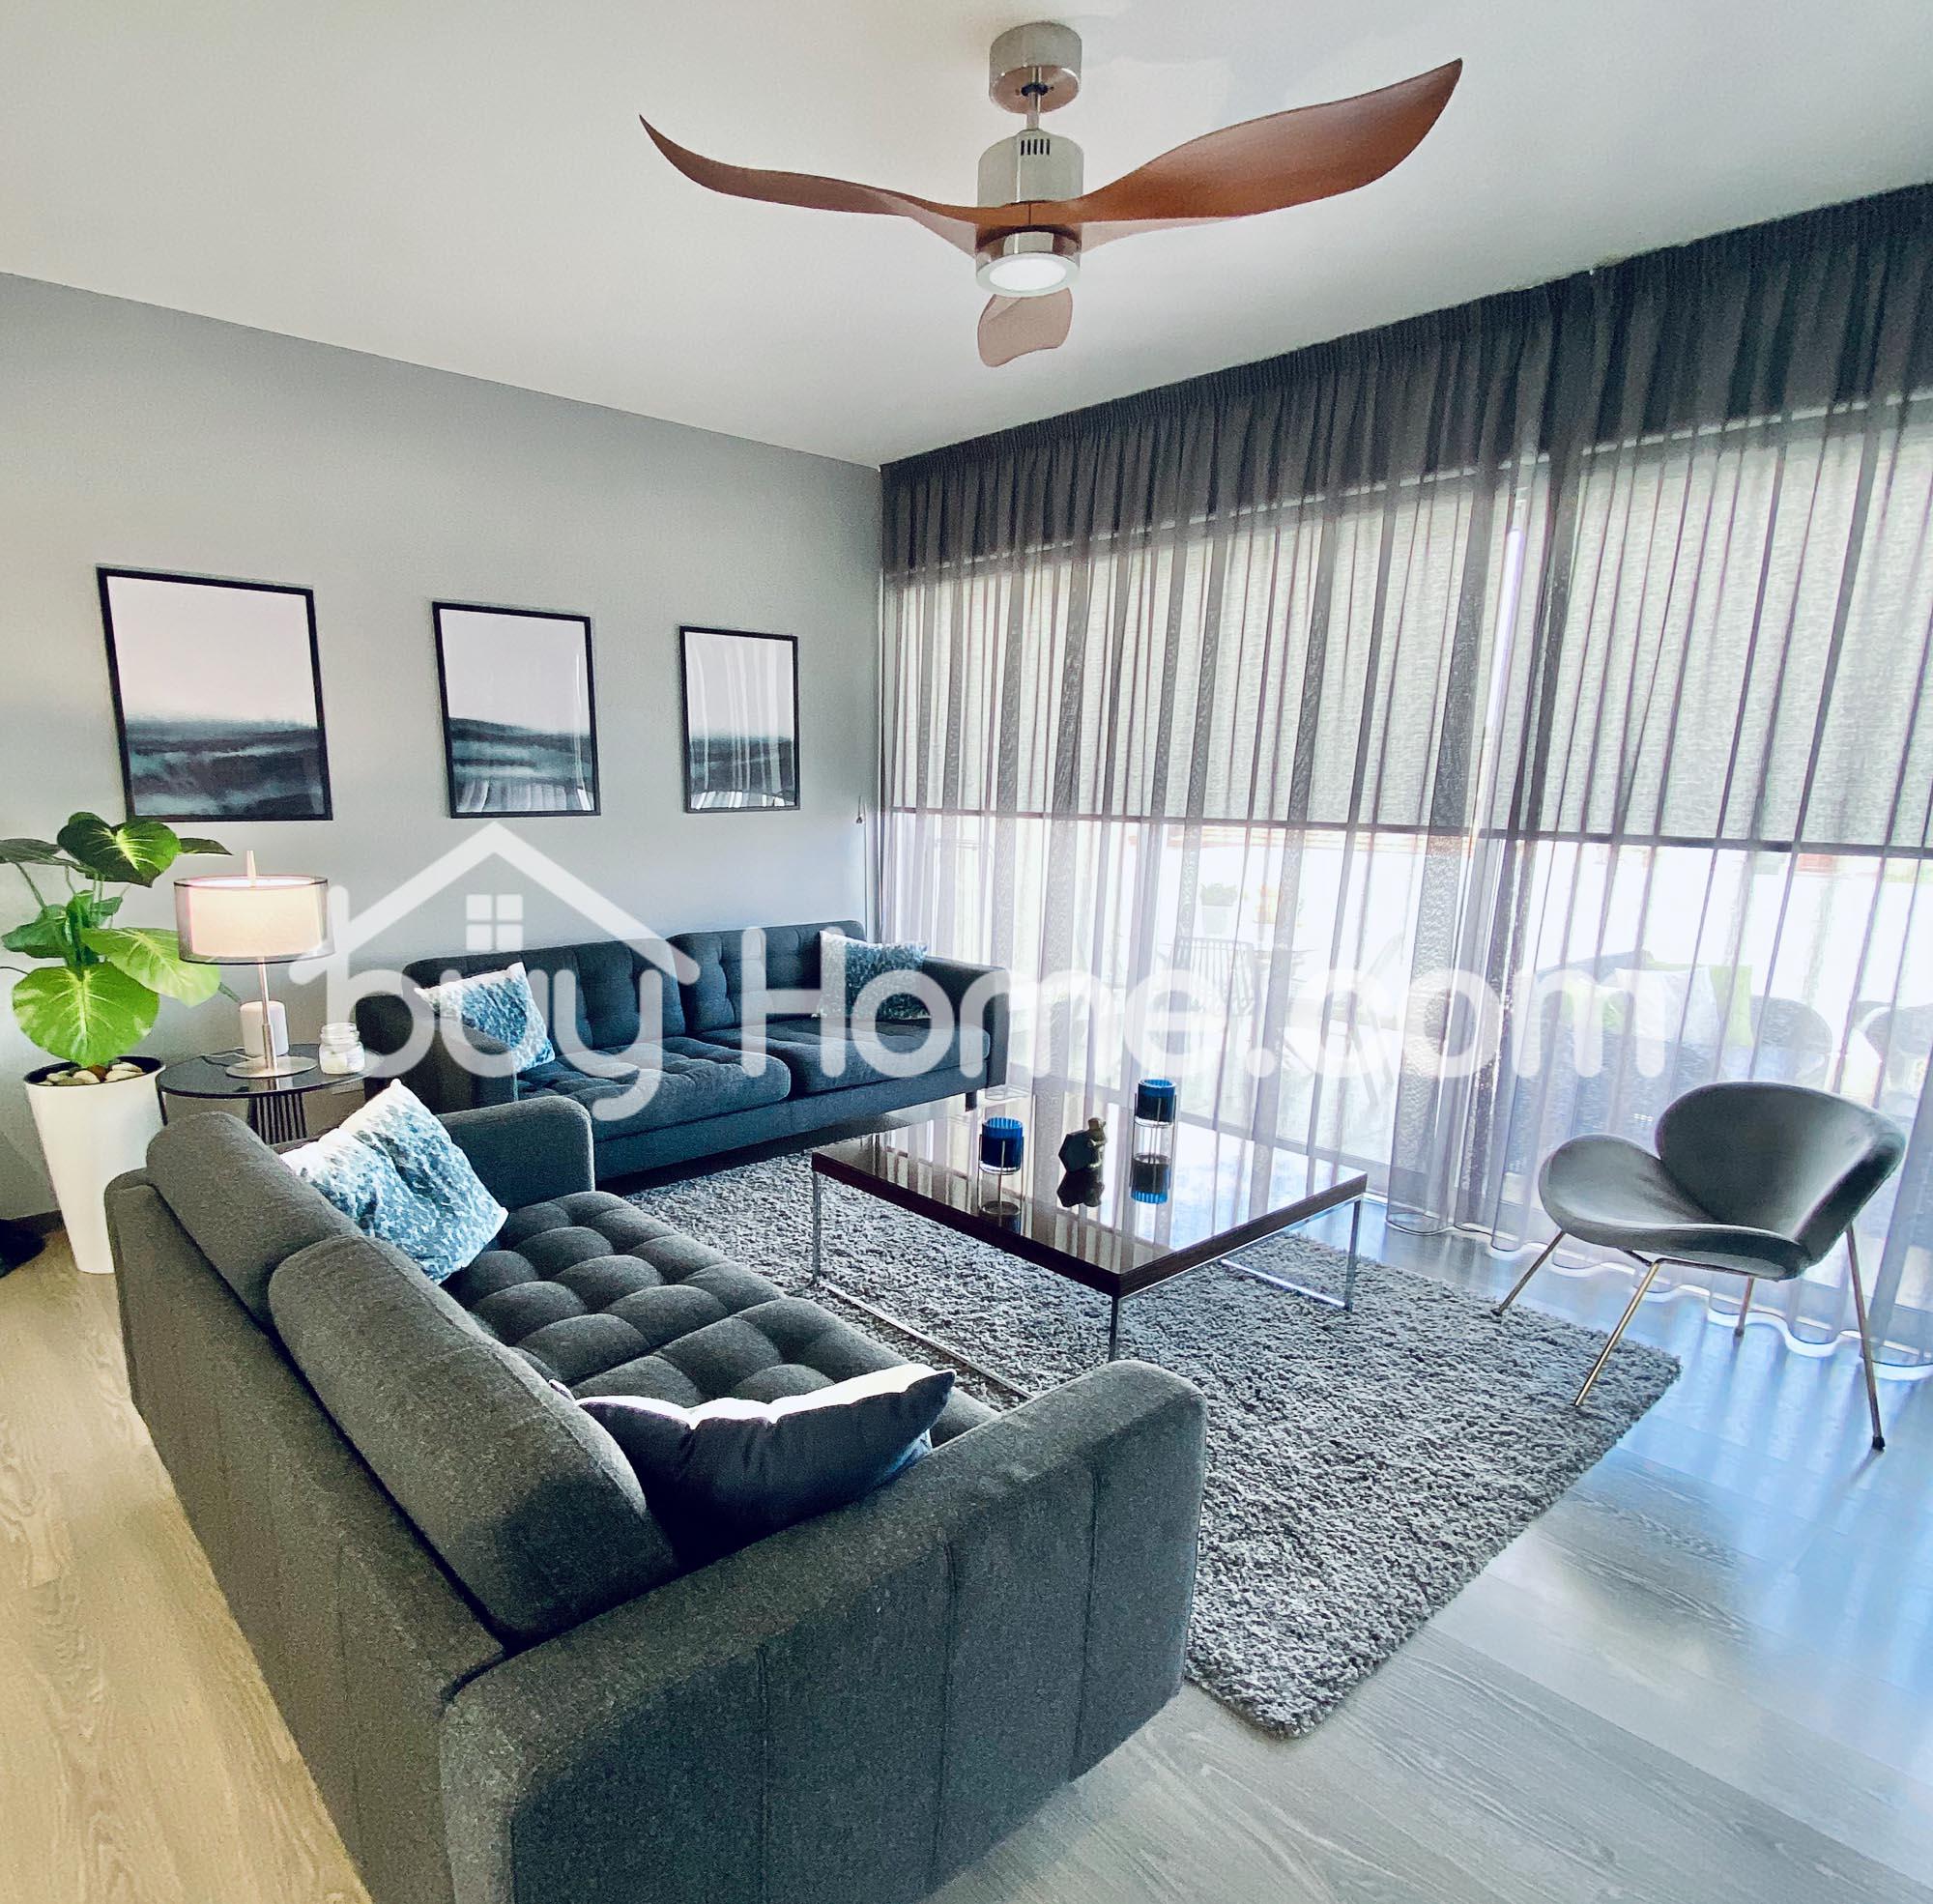 Deluxe 2 Bedroom Apartment | BuyHome